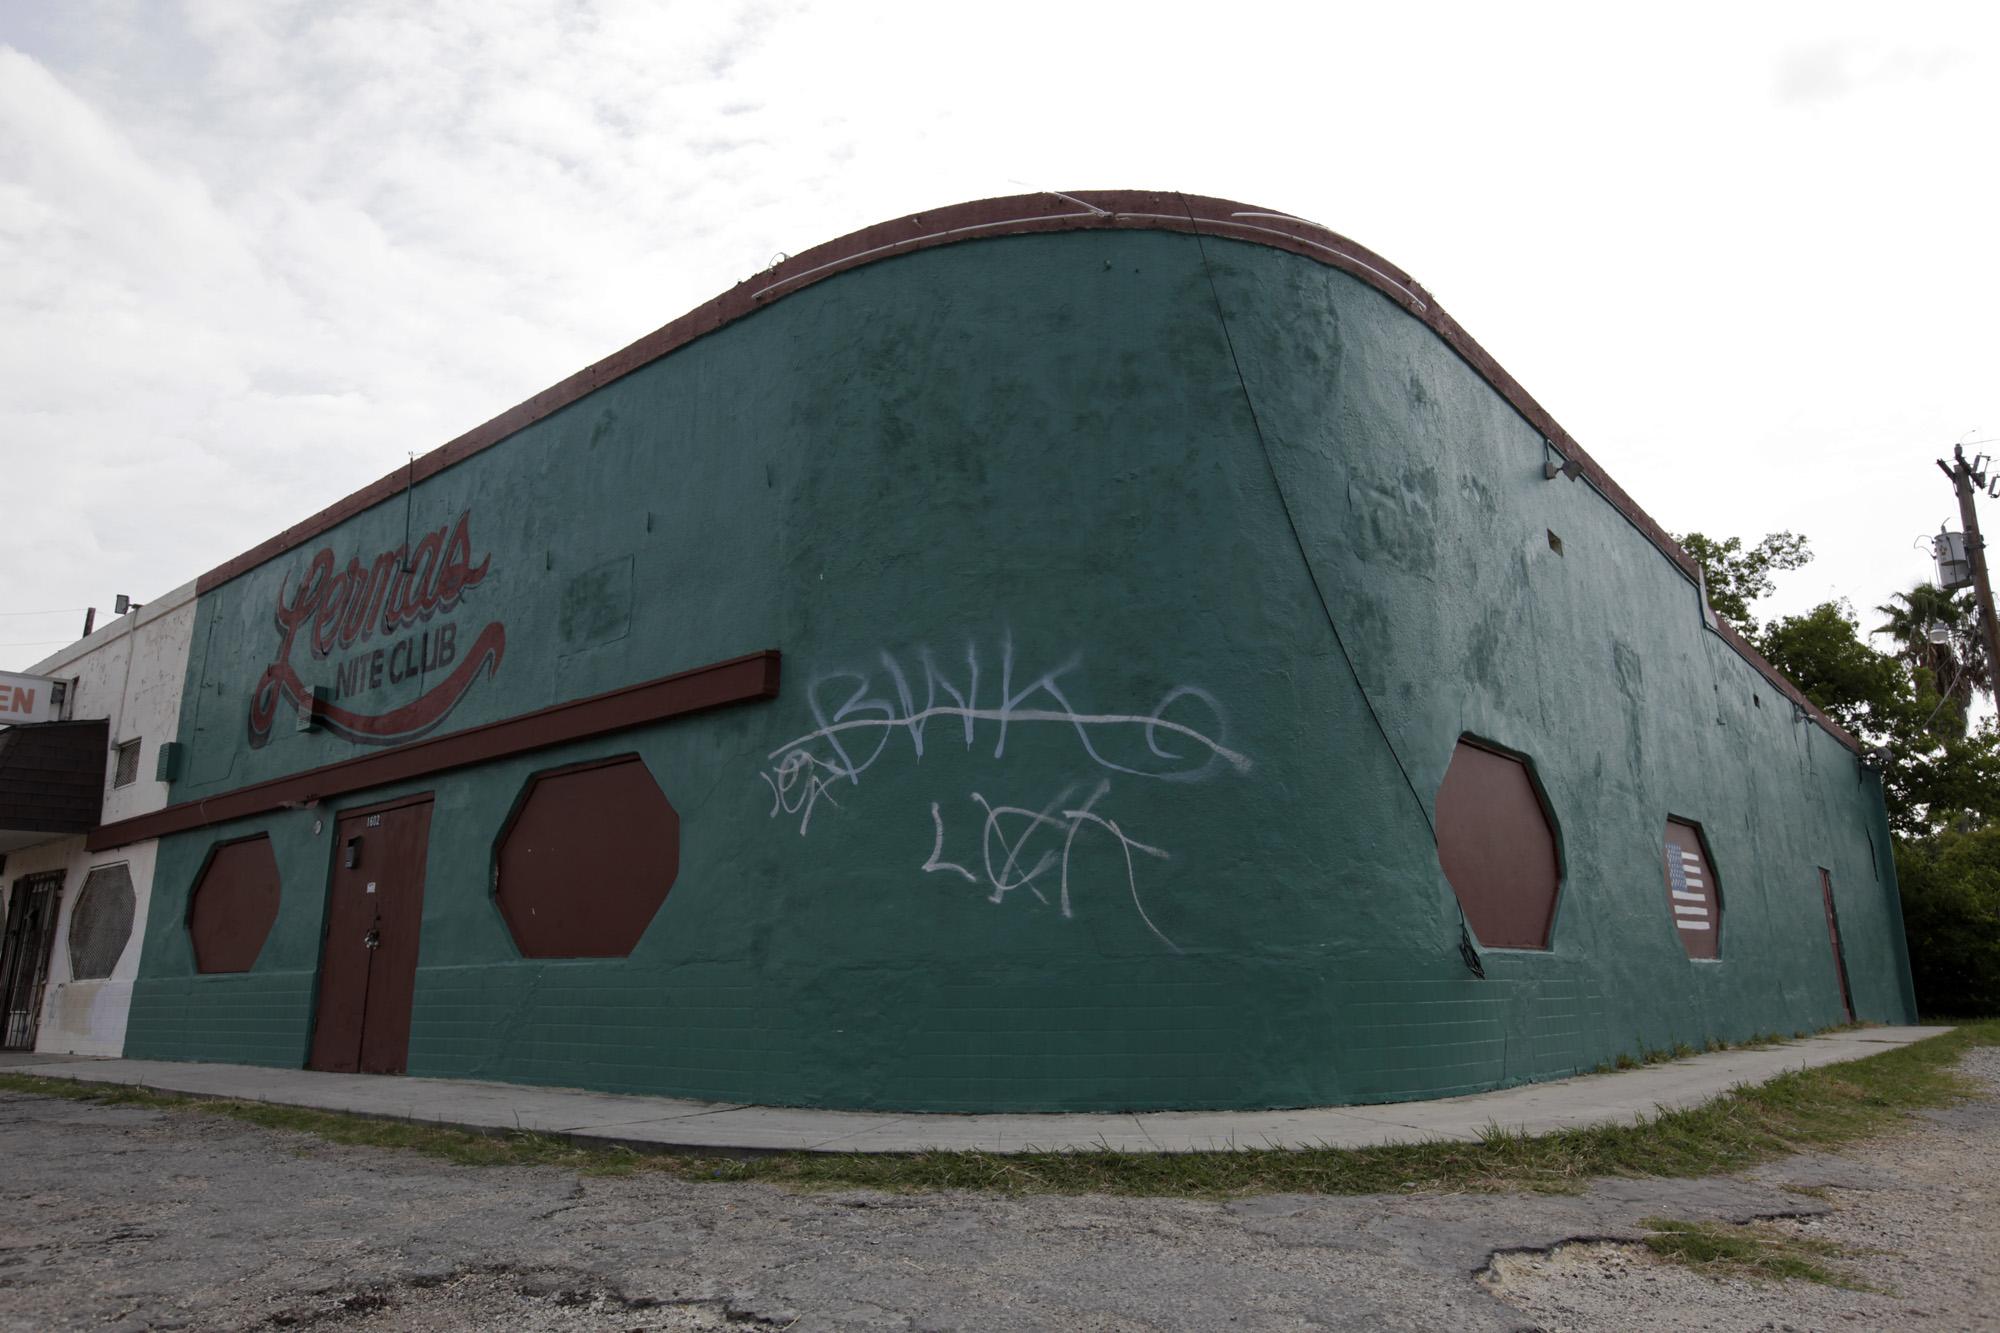 Lerma S Nite Club On Endangered List San Antonio Express